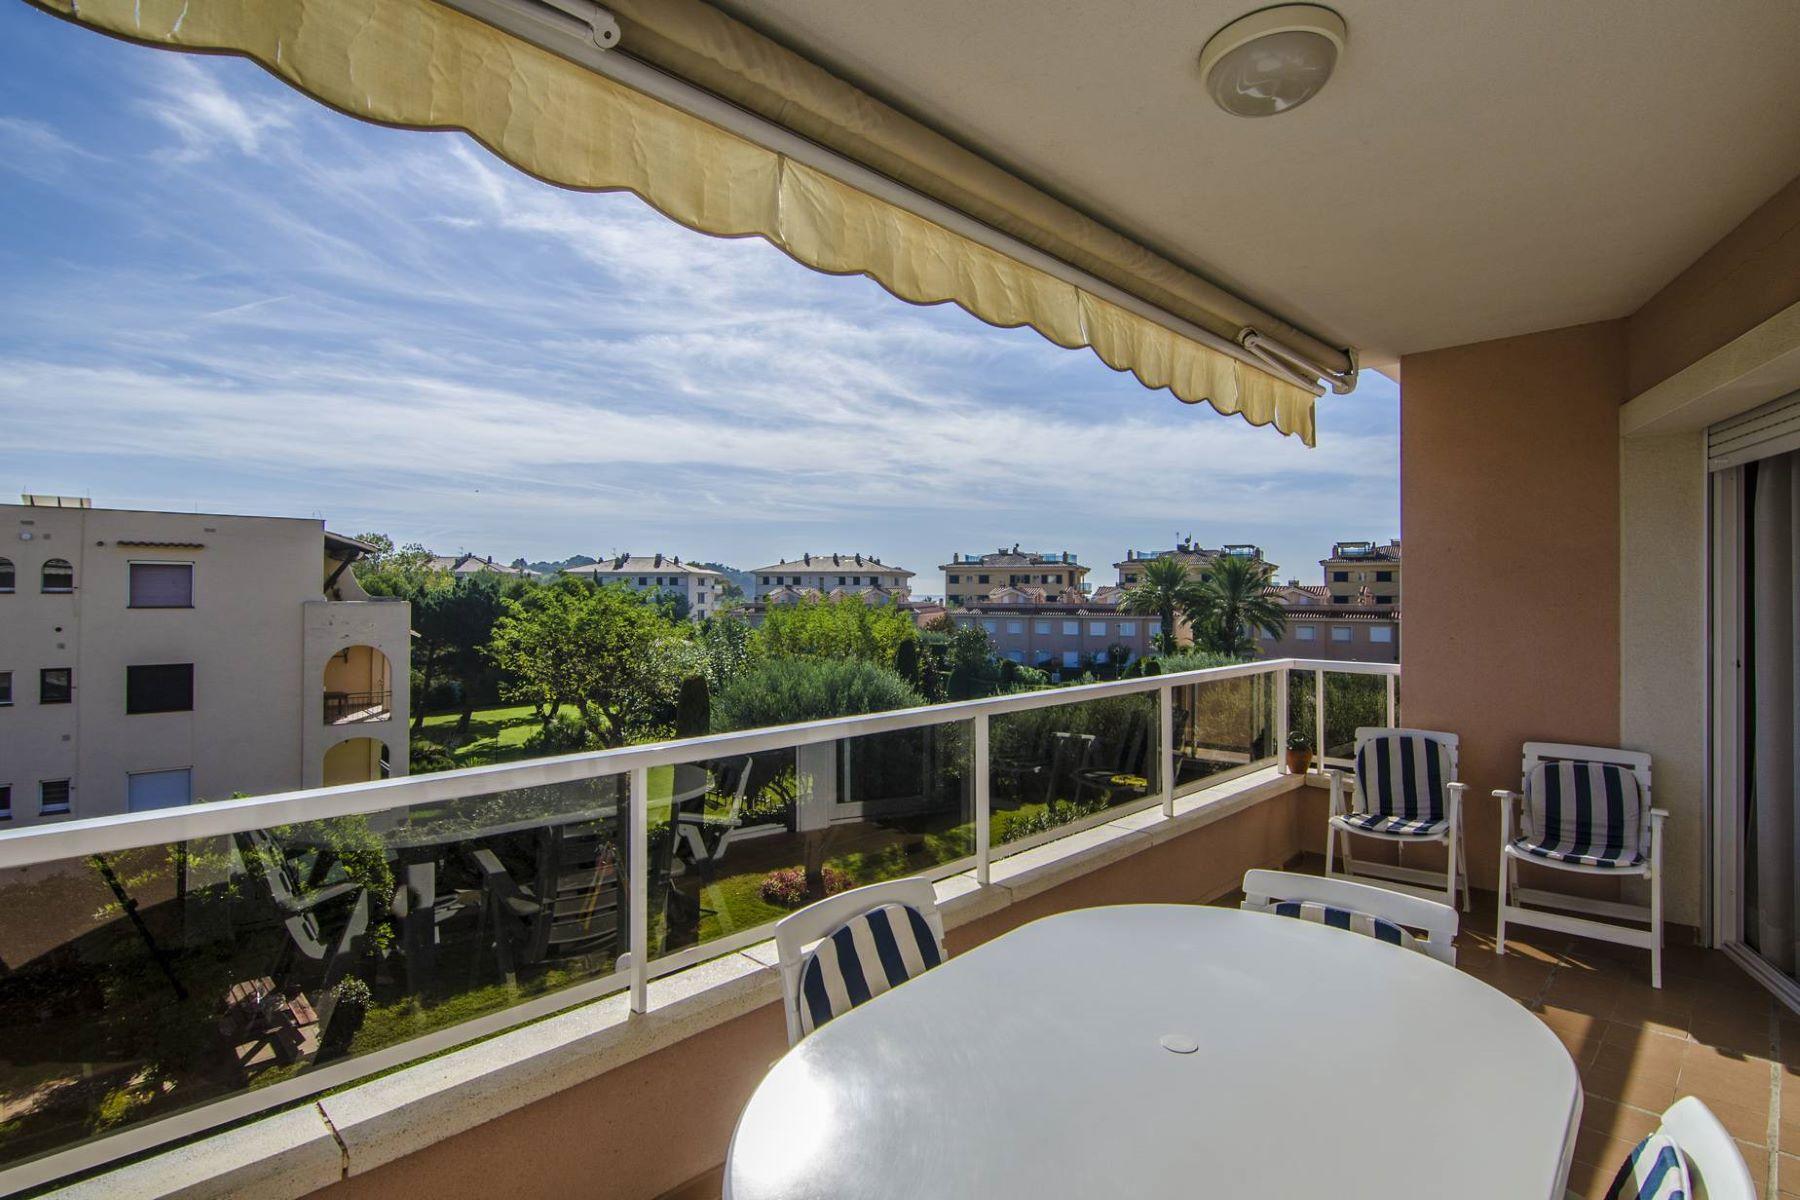 Apartamento para Venda às Nice duplex penthouse in S'Agaró just 150 metres from the beach S'Agaro, Costa Brava, 17248 Espanha